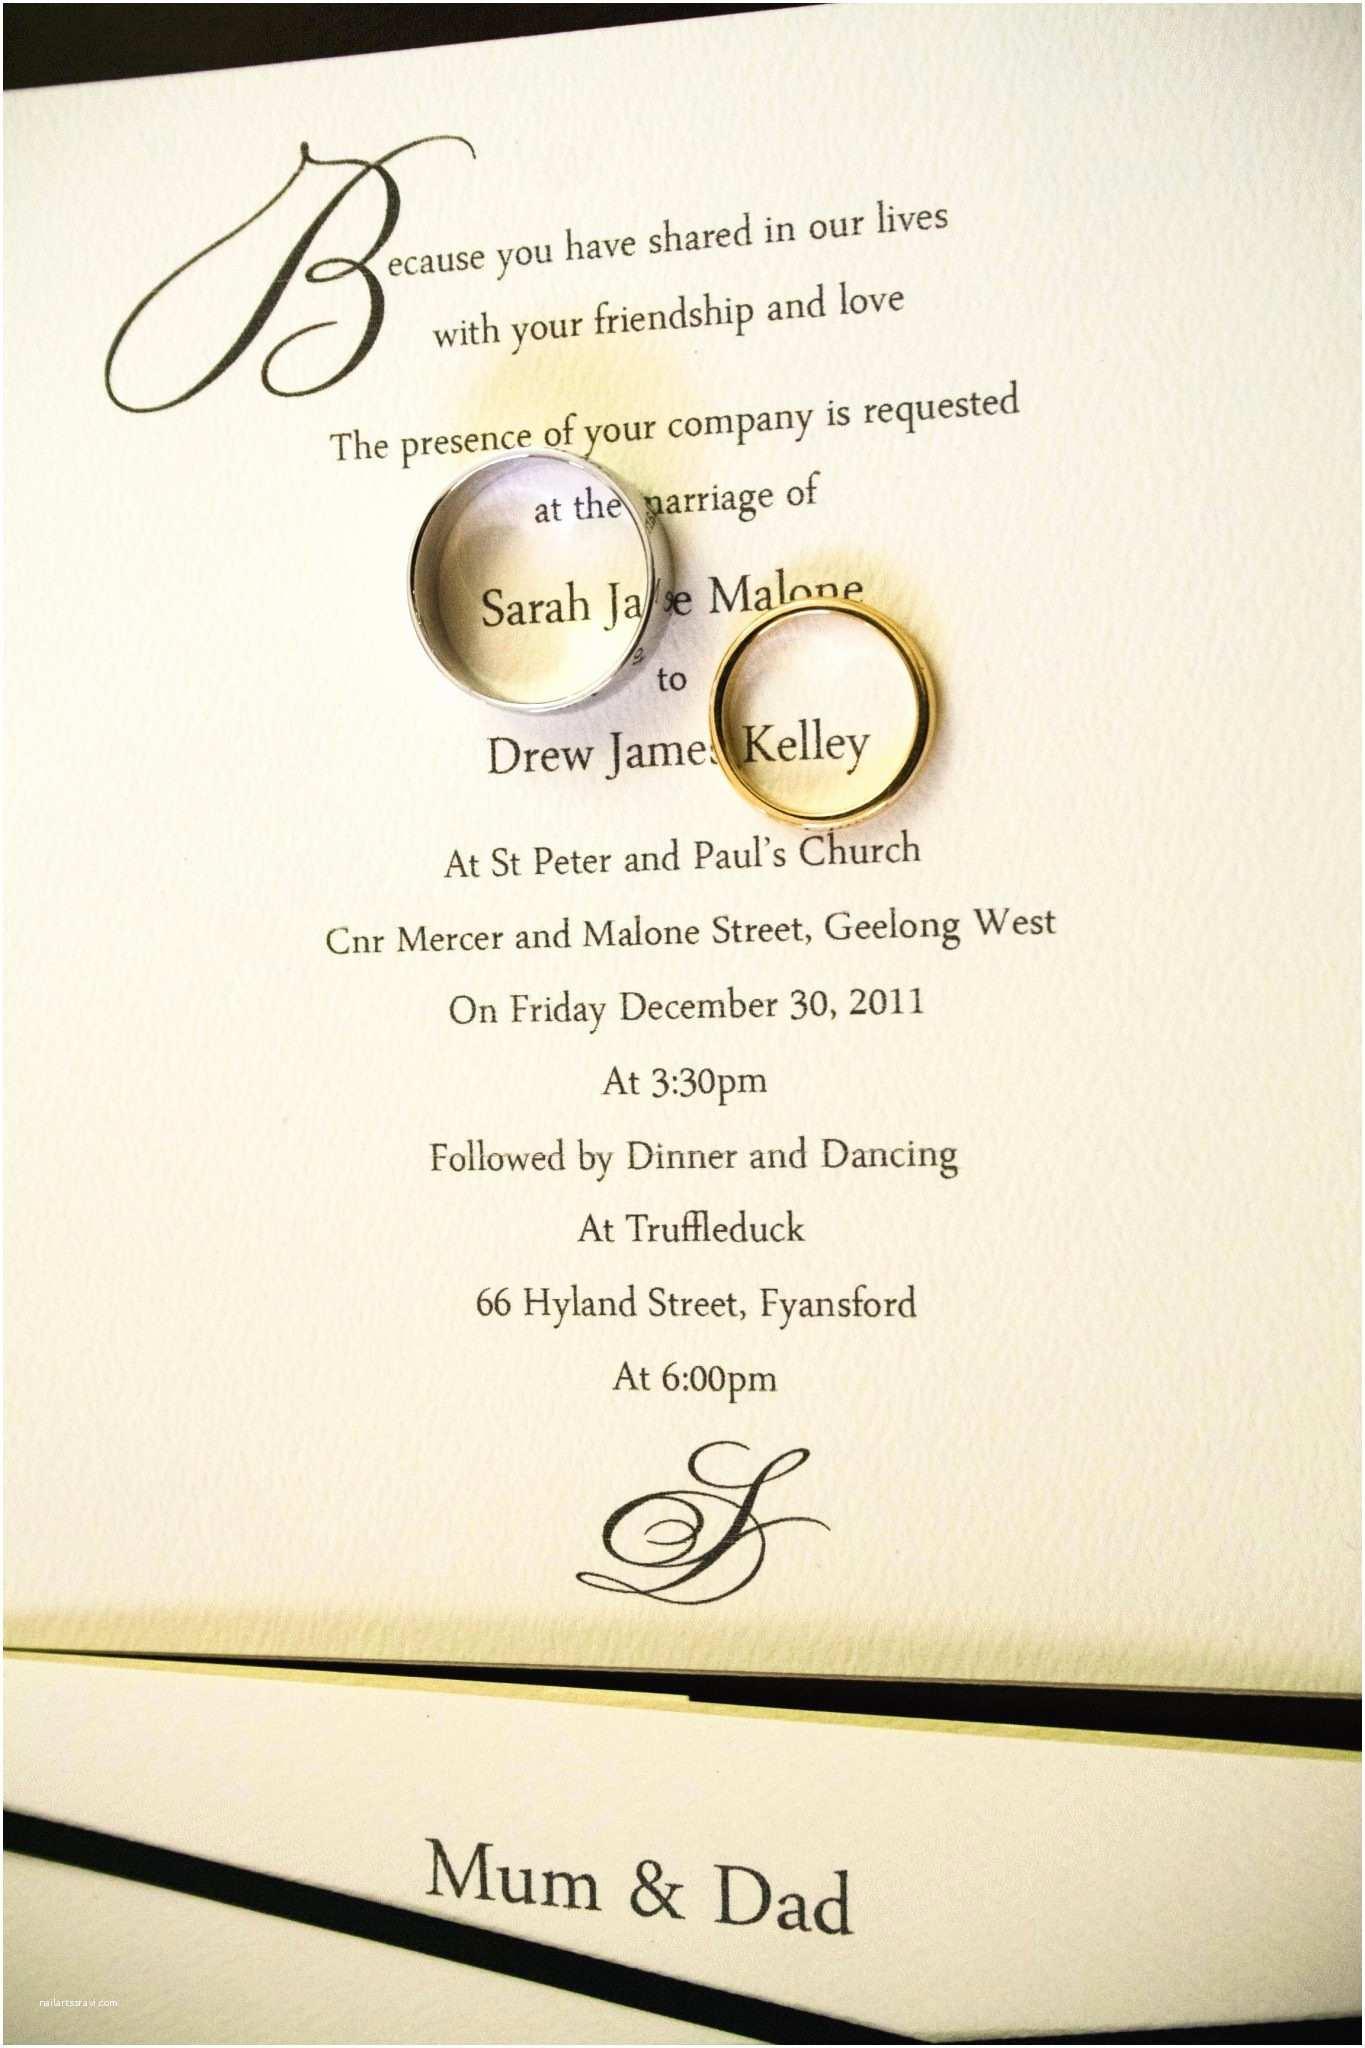 Wedding Invitation Maker with Photo Wedding Invitation Makers In Cumbria Tags Invi and